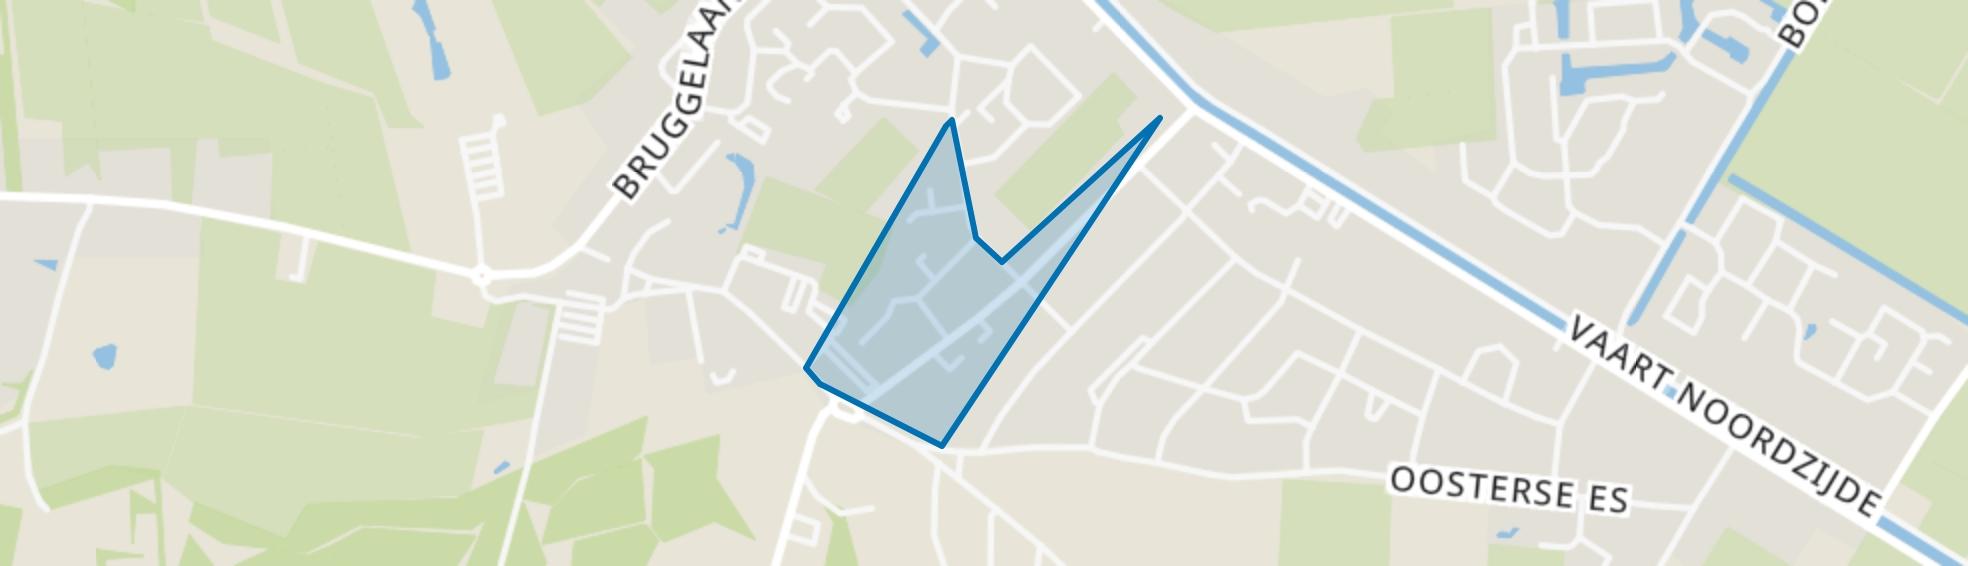 Appelscha-Van Emstweg, Appelscha map